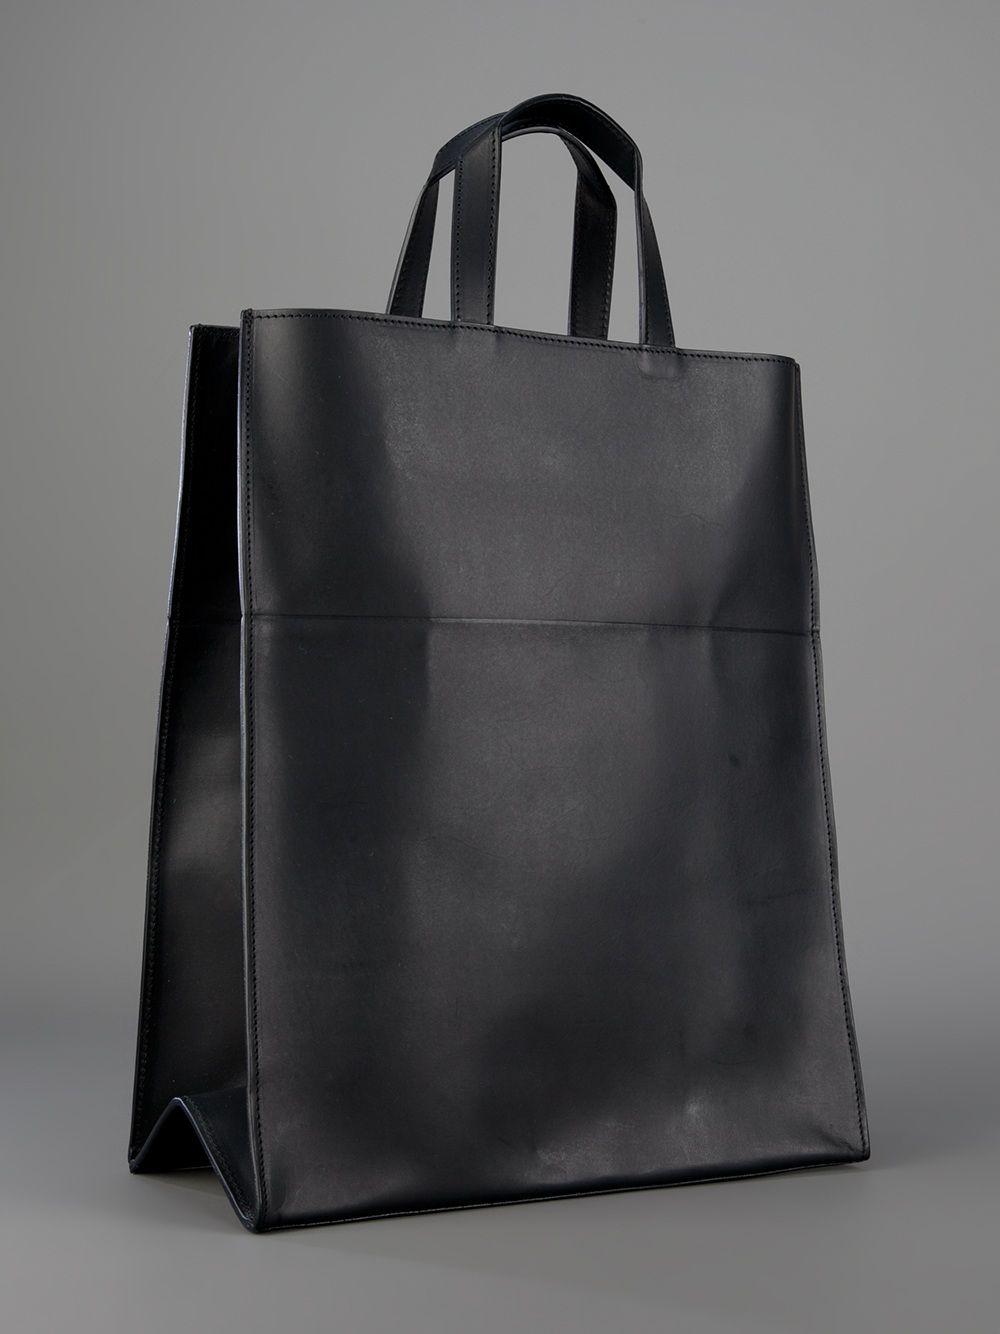 1a24ba169d3c martin margiela Creative Bag, Bag Men, Shopper Tote, Maison Martin  Margiela, Leather